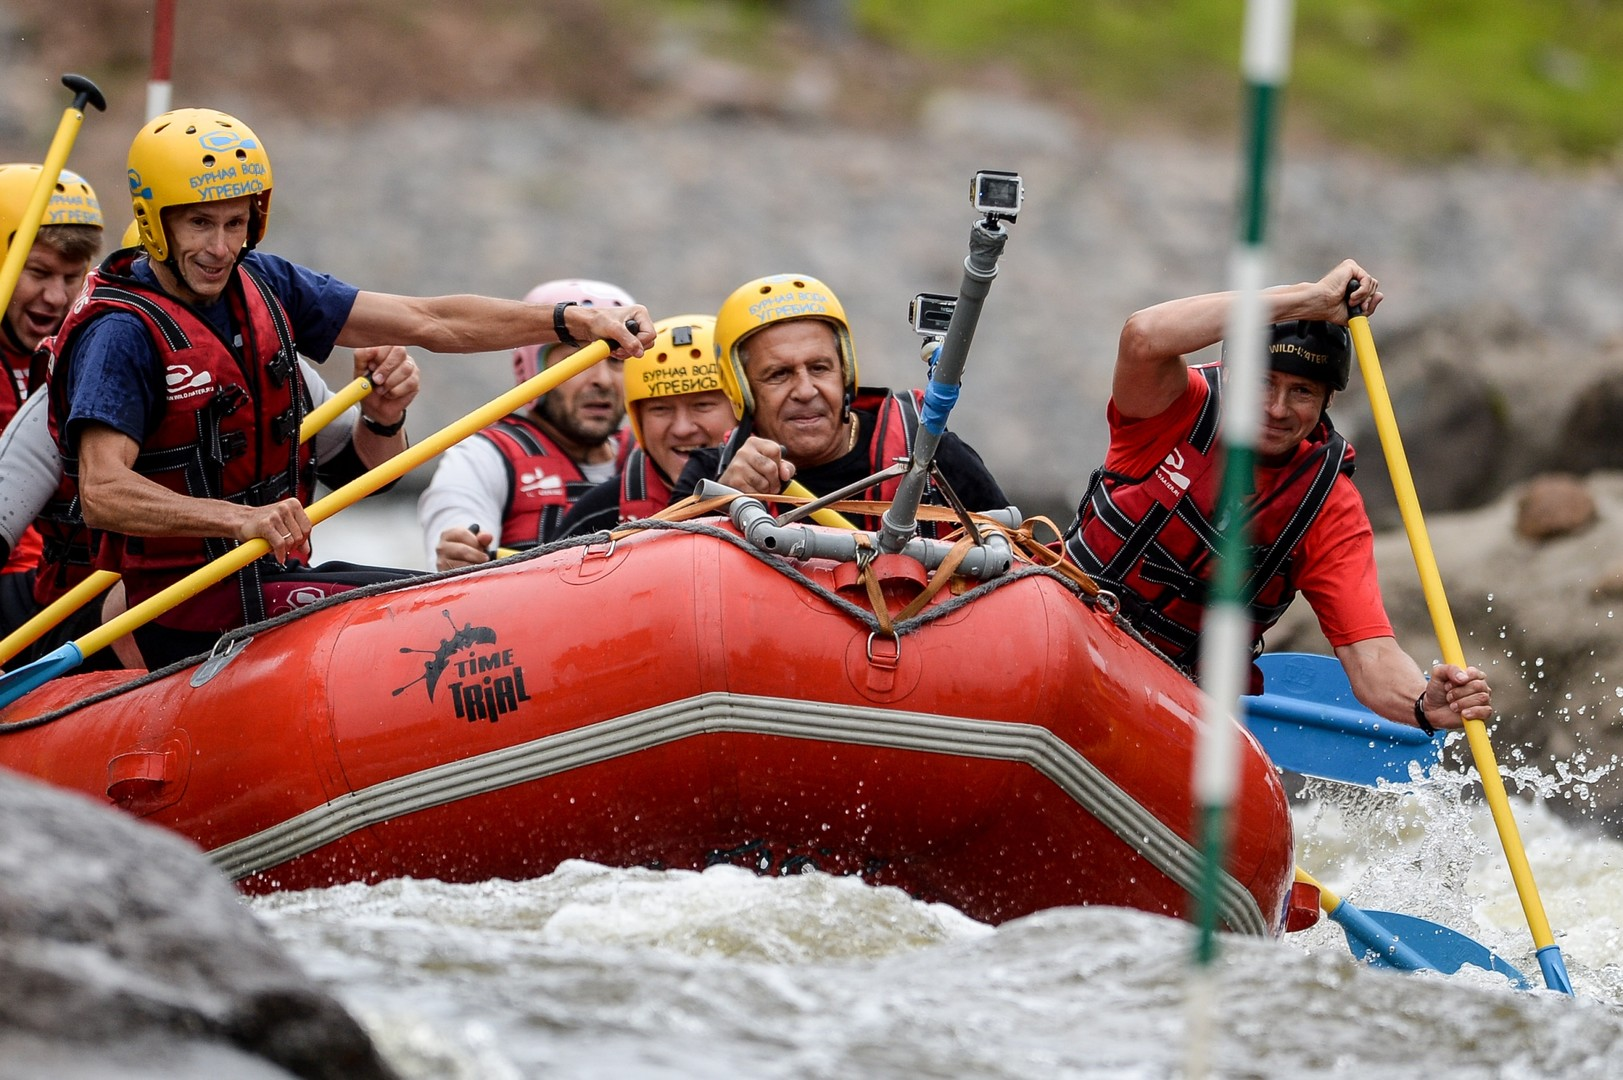 Lawrow probierte 2015 in Nowgorod das Rafting aus.